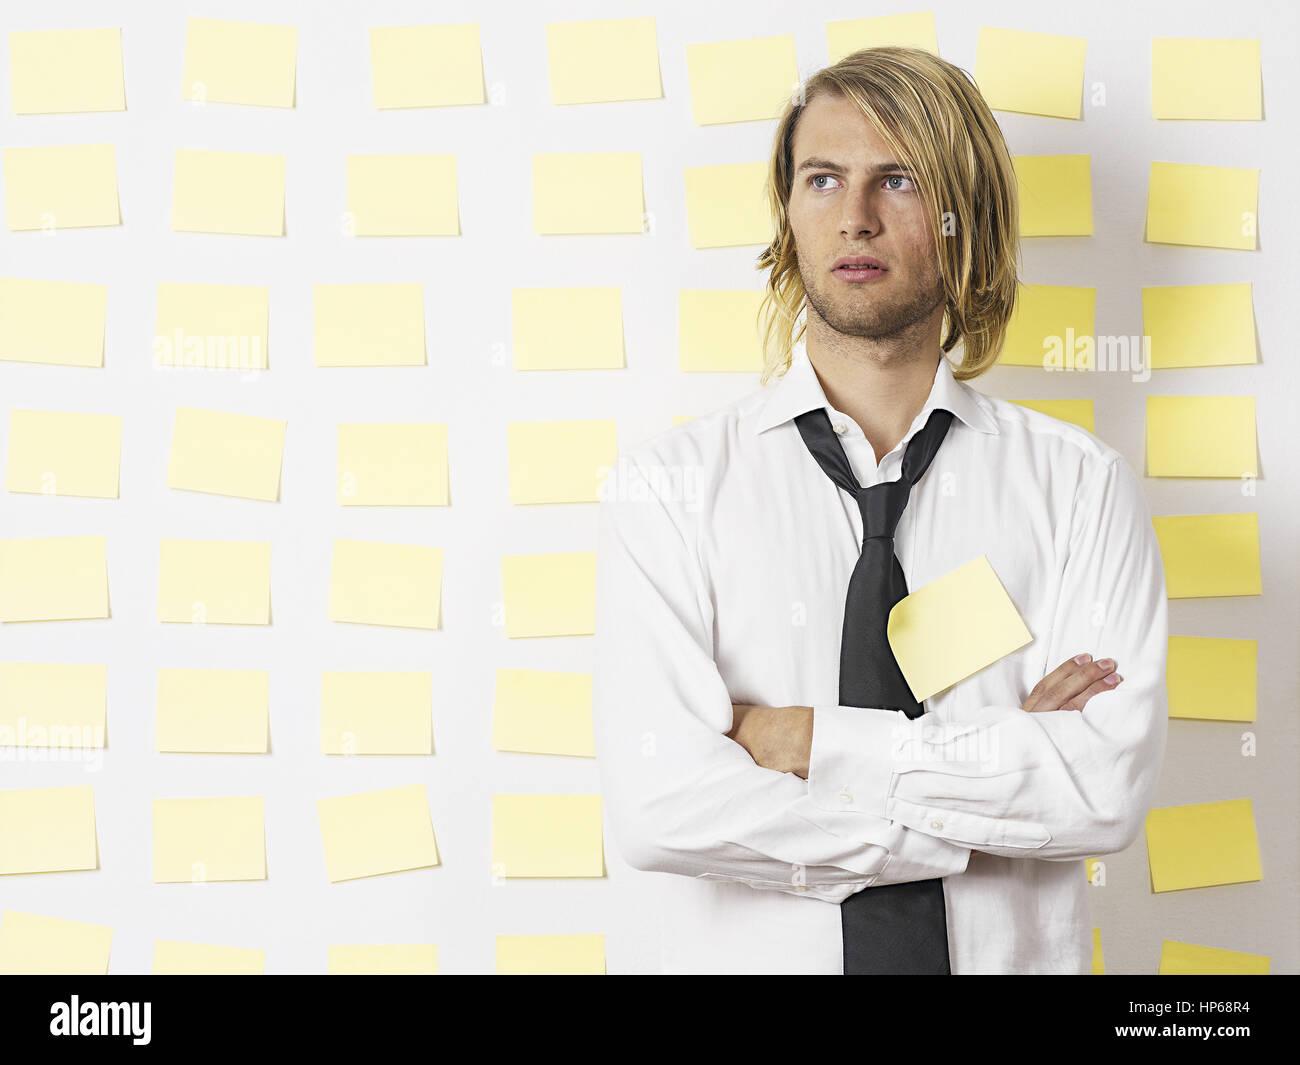 Junger Mann en Hemd und Krawatte steht vor verschraenkte Postit-Wand, Armenia (modelo-liberado) Foto de stock